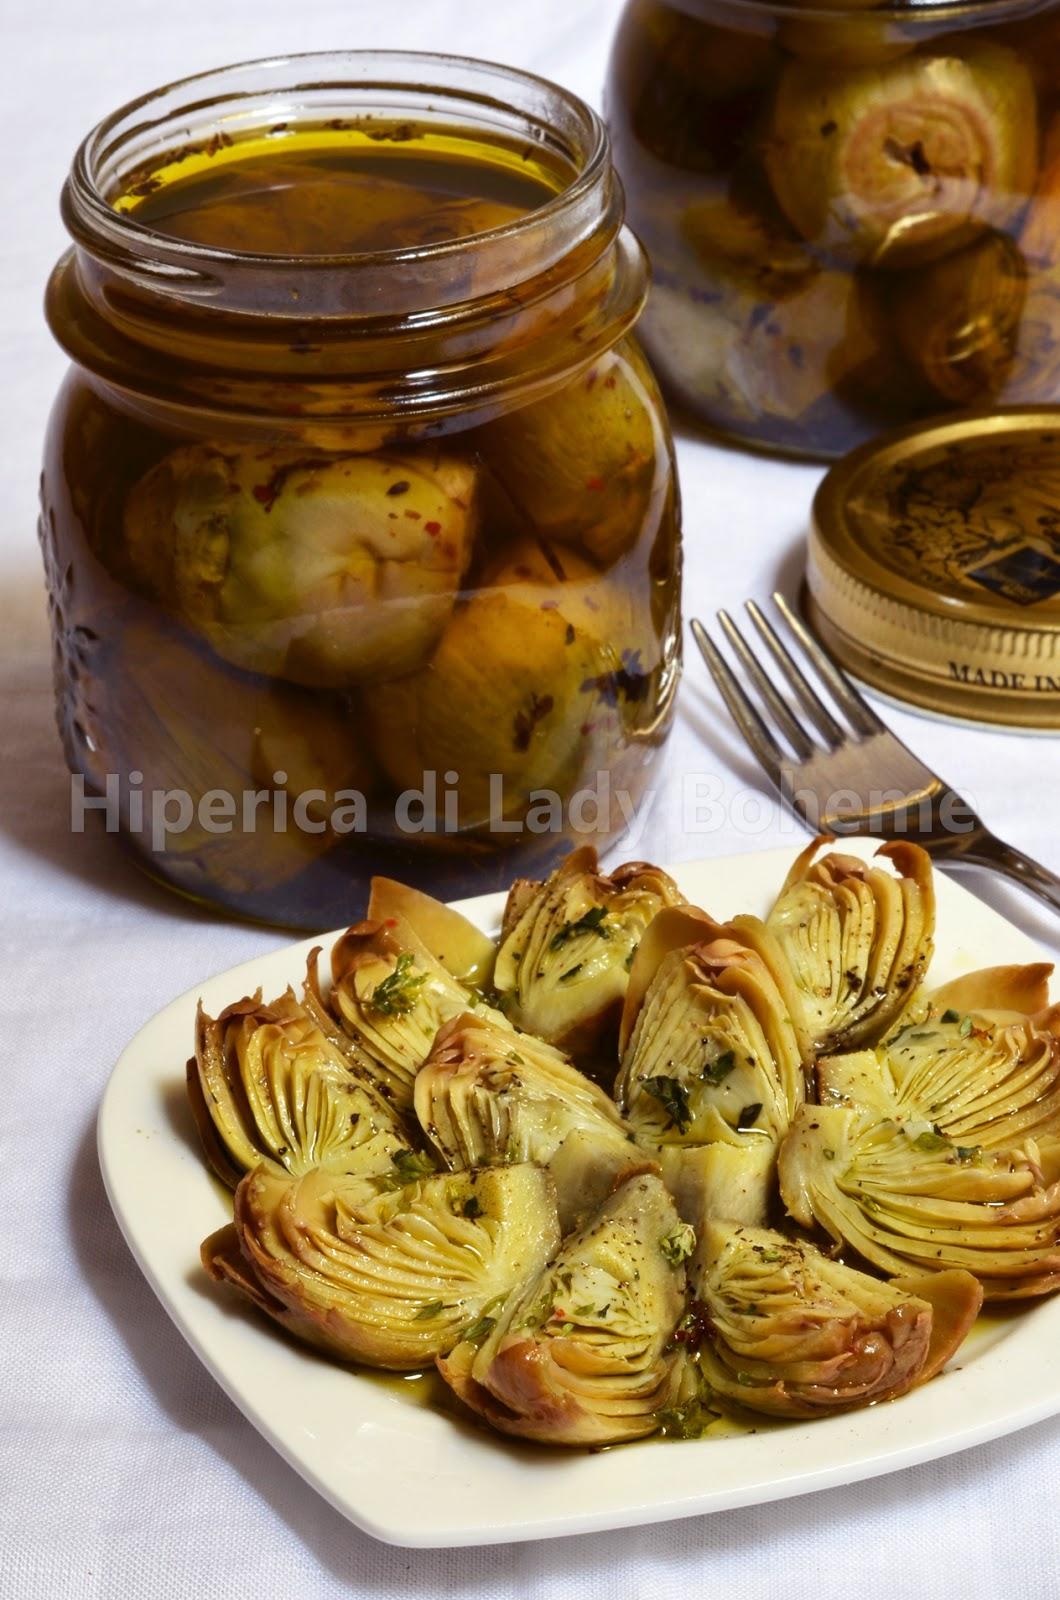 hiperica_lady_boheme_blog_cucina_ricette_gustose_facili_veloci_carciofini_sotto_olio_2